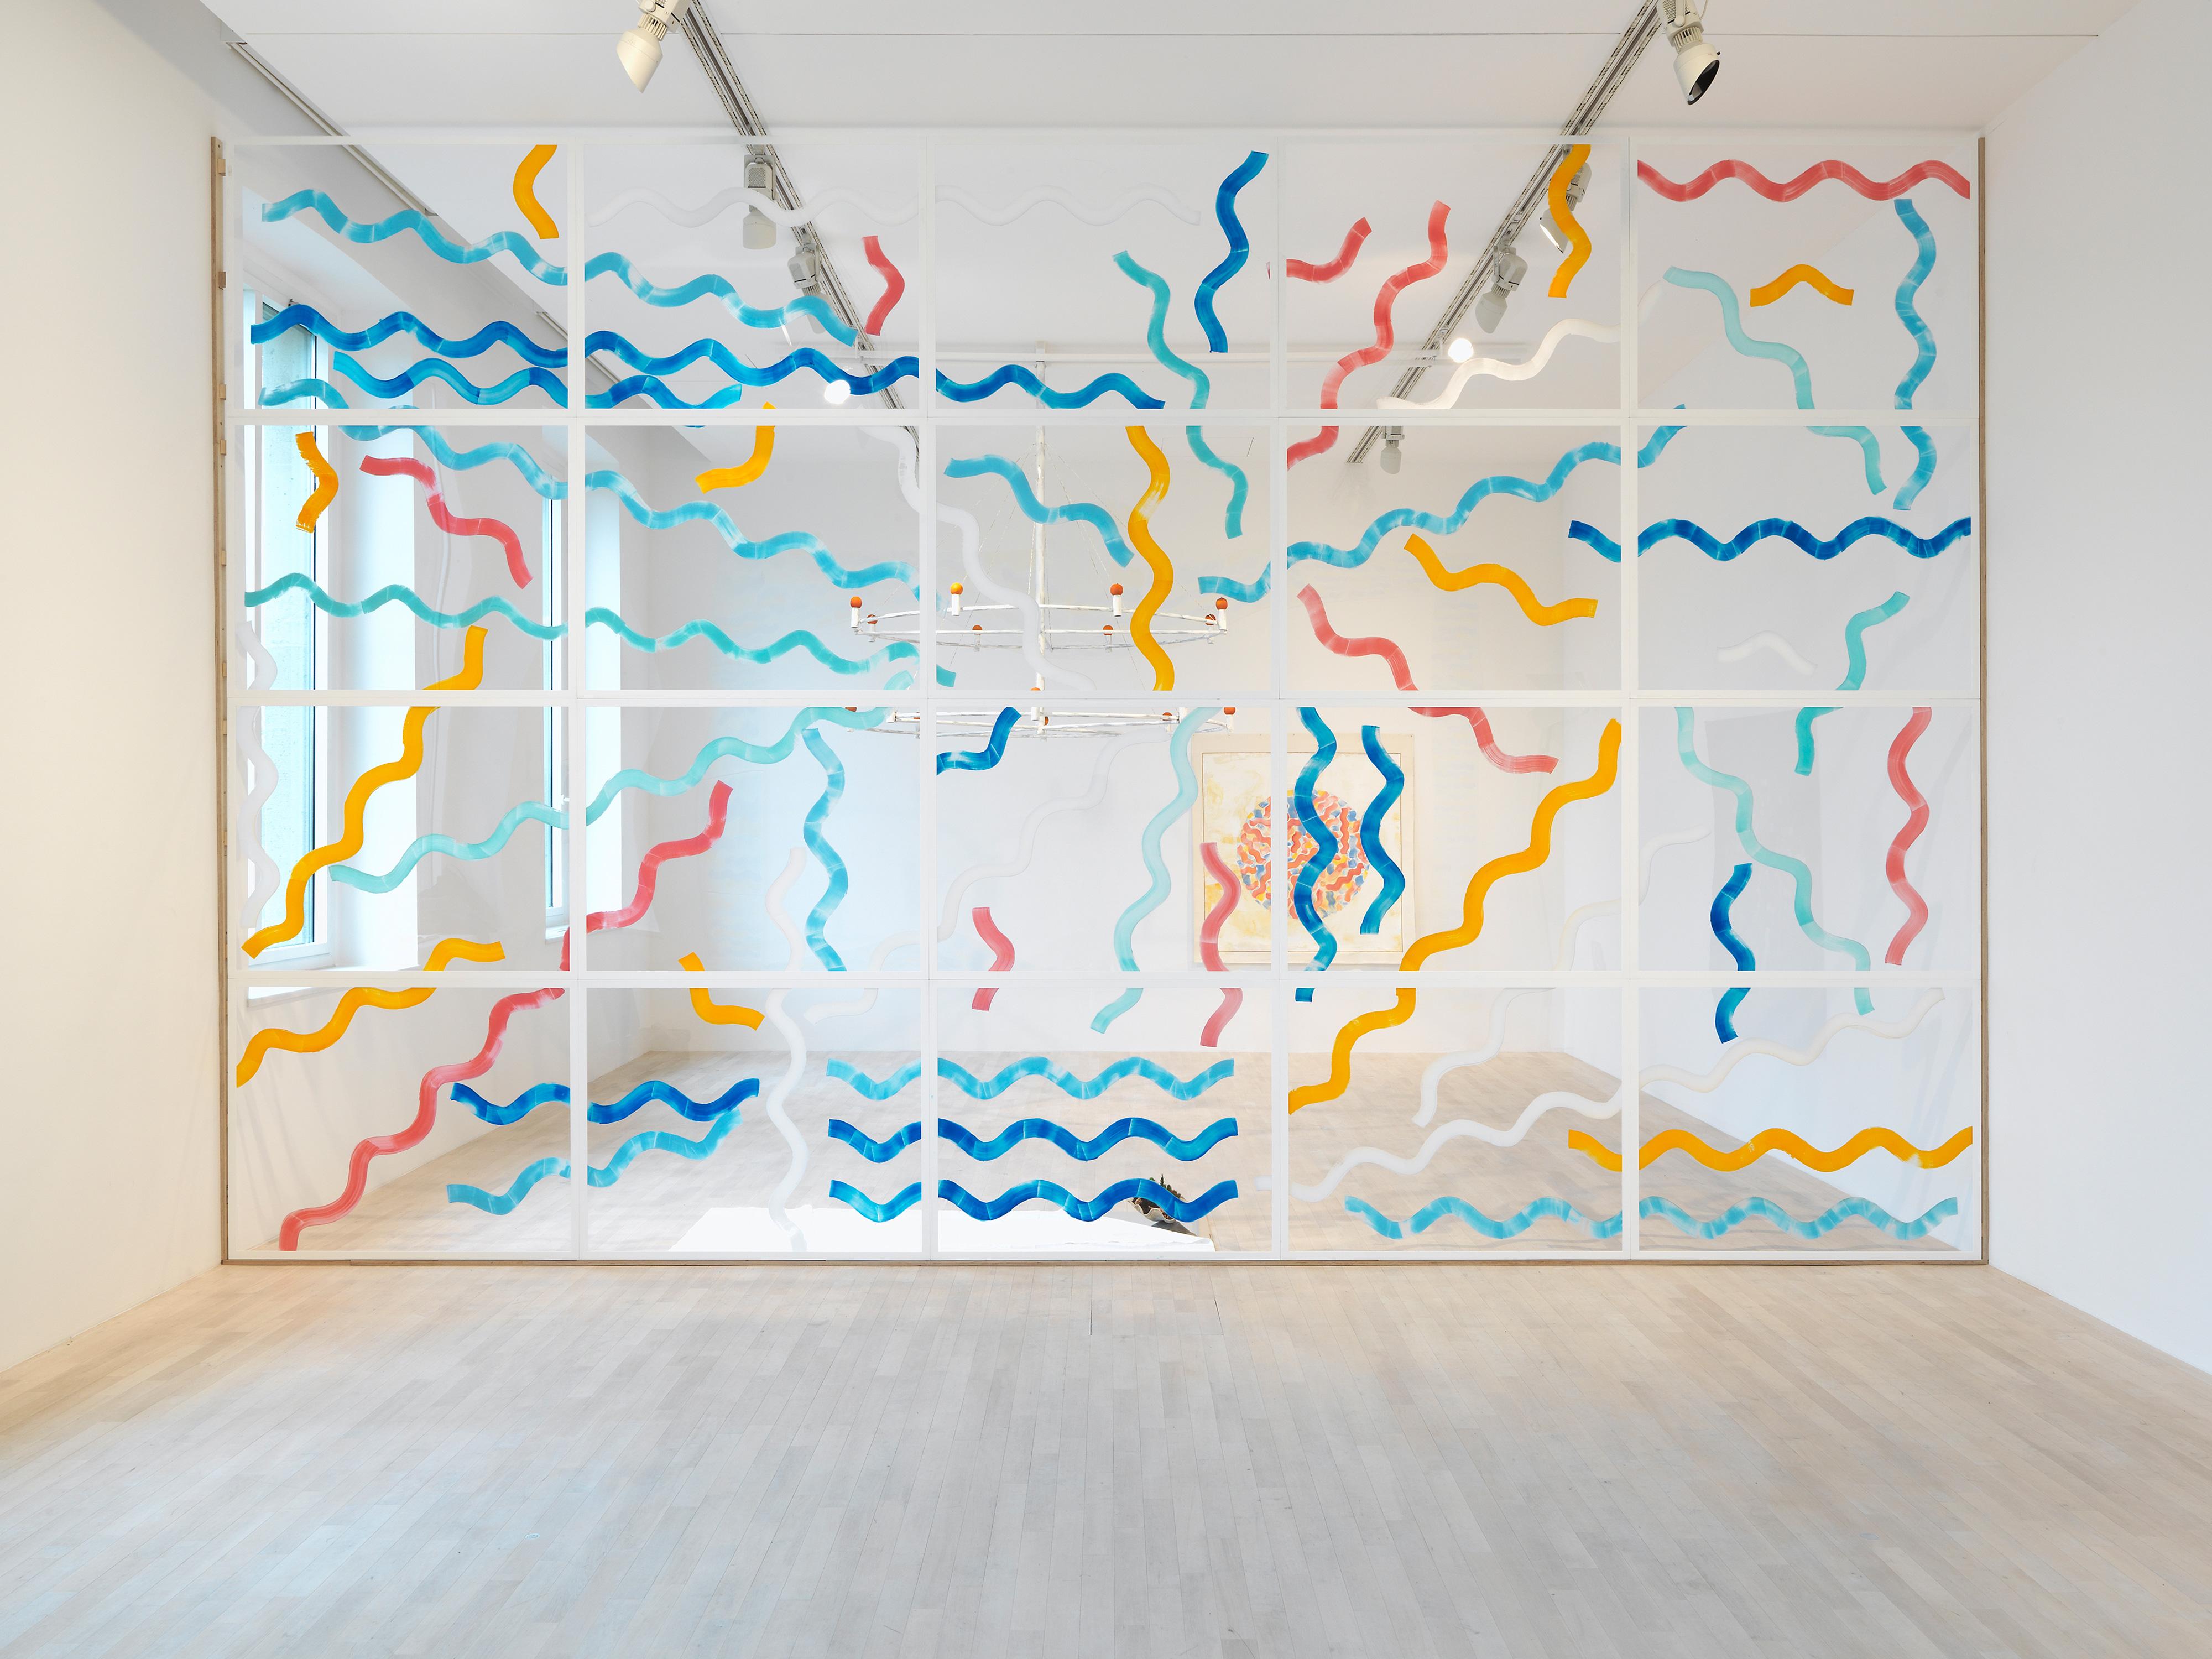 Galerie Barbara Thumm \ Diango Hernández